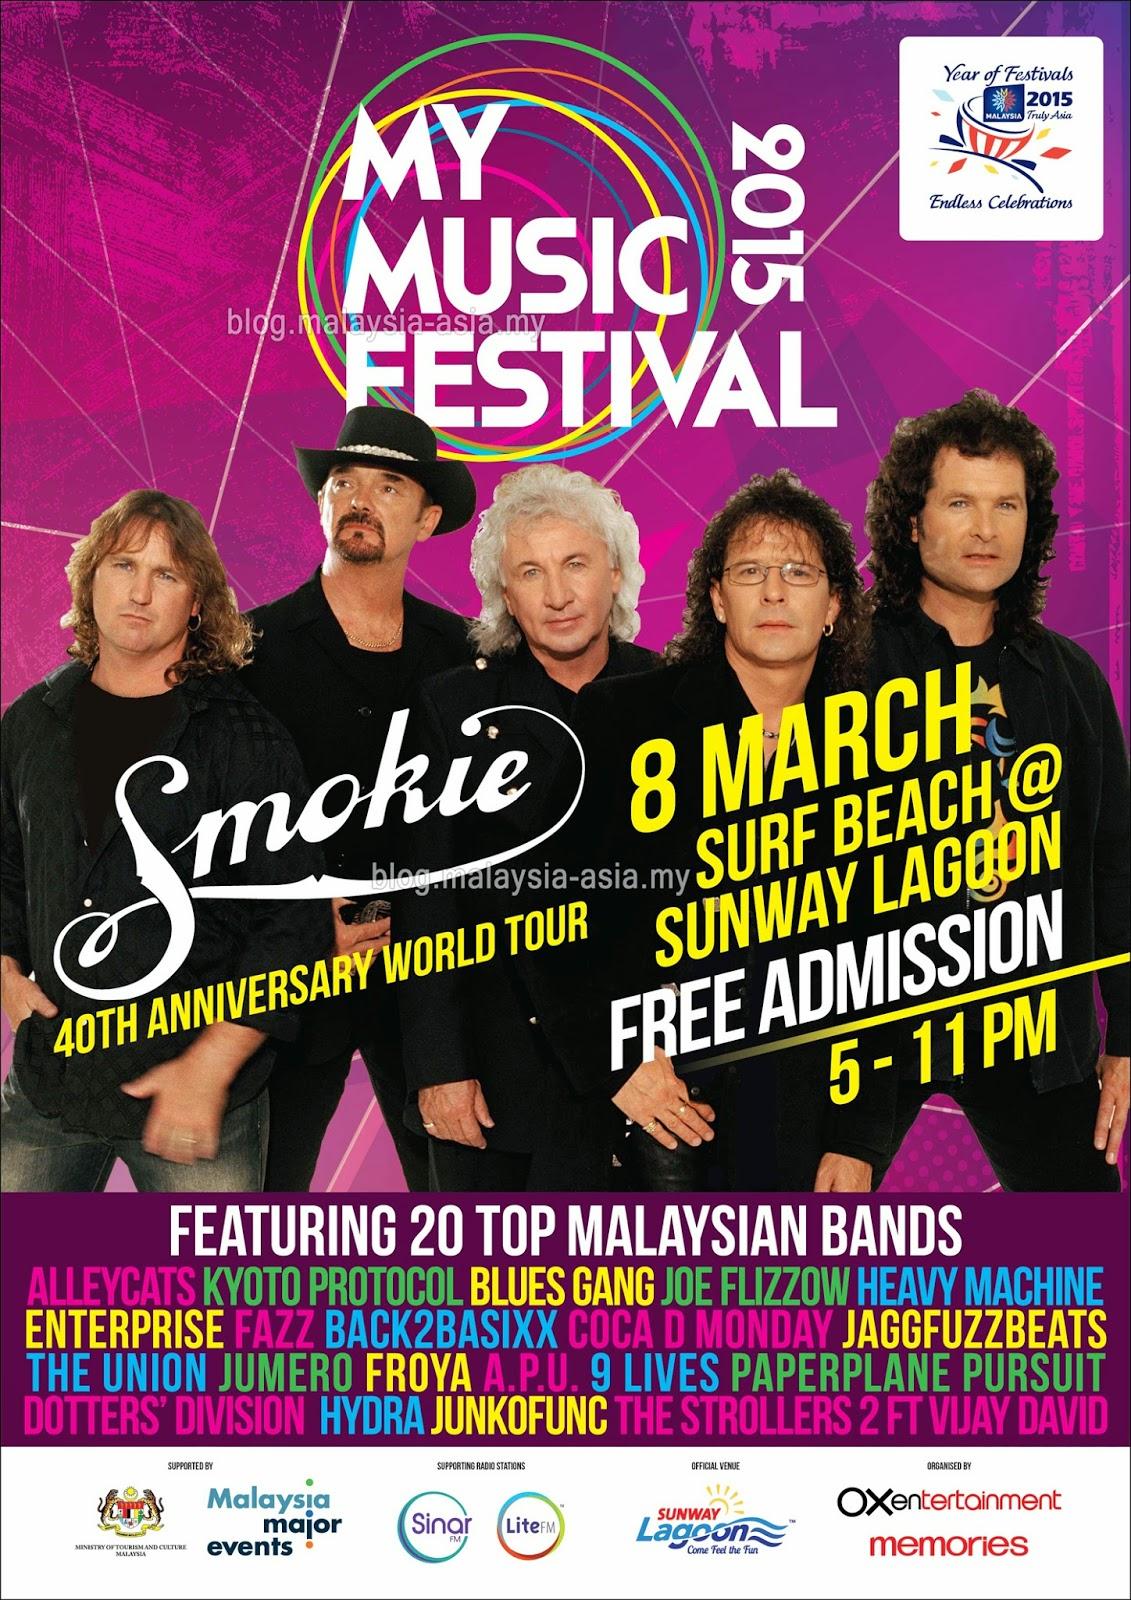 My Music Festival 2015